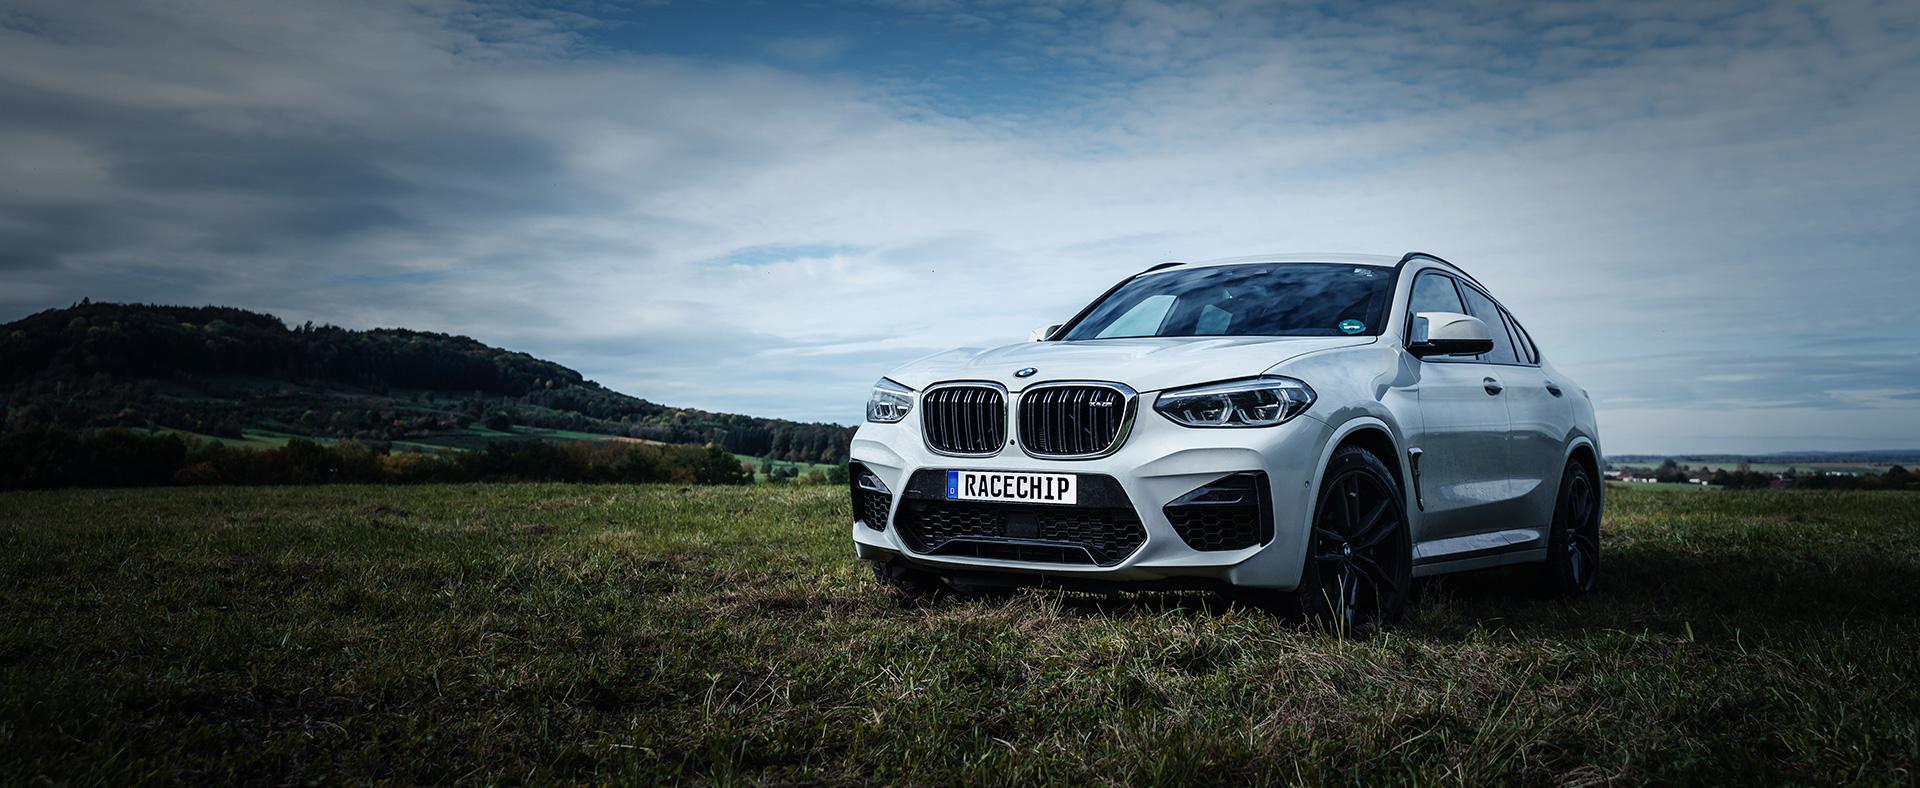 BMW M135i vs. M140i – is the M135i a worthy successor?